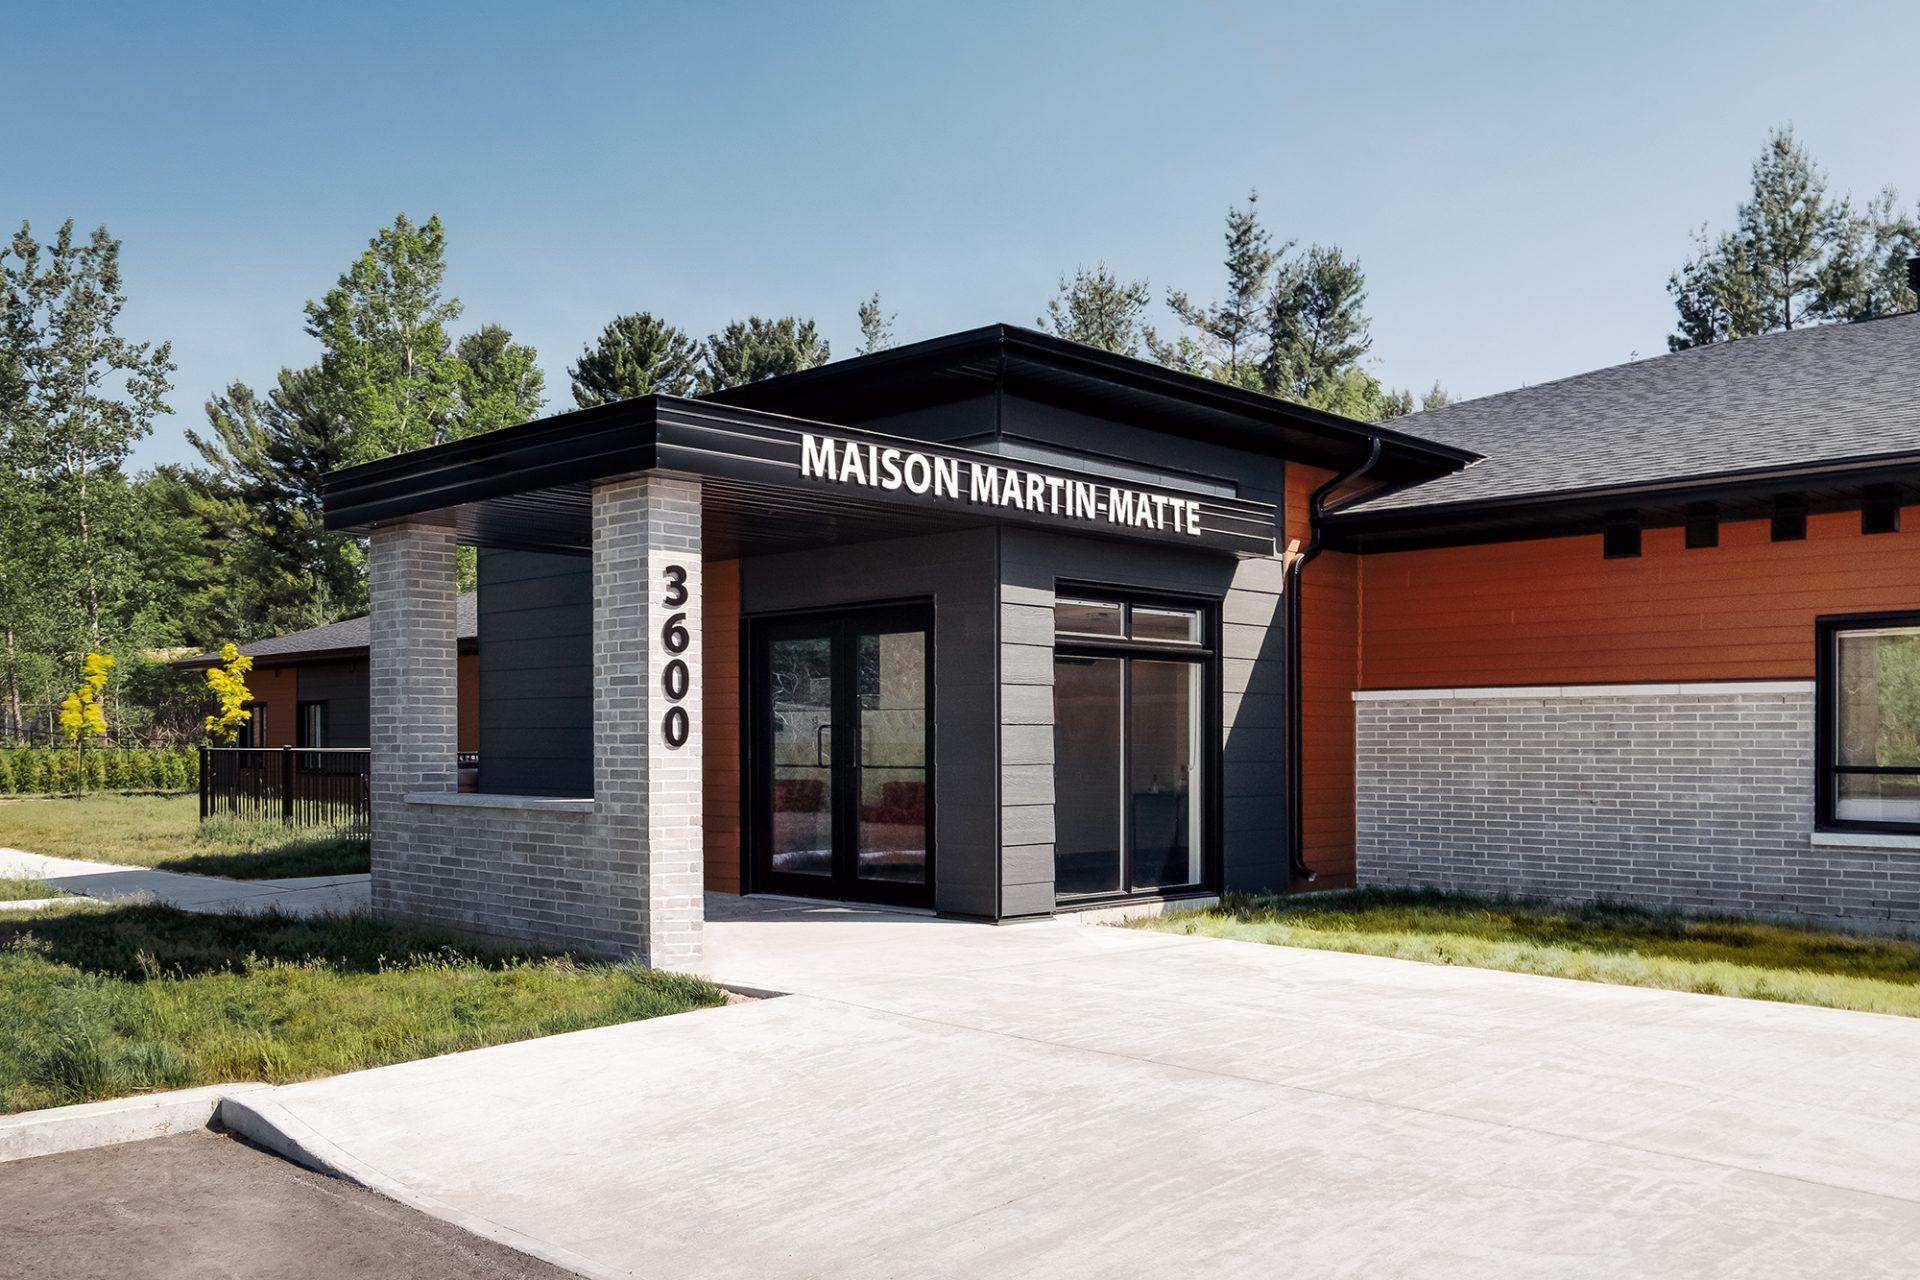 Maison Martin-Matte